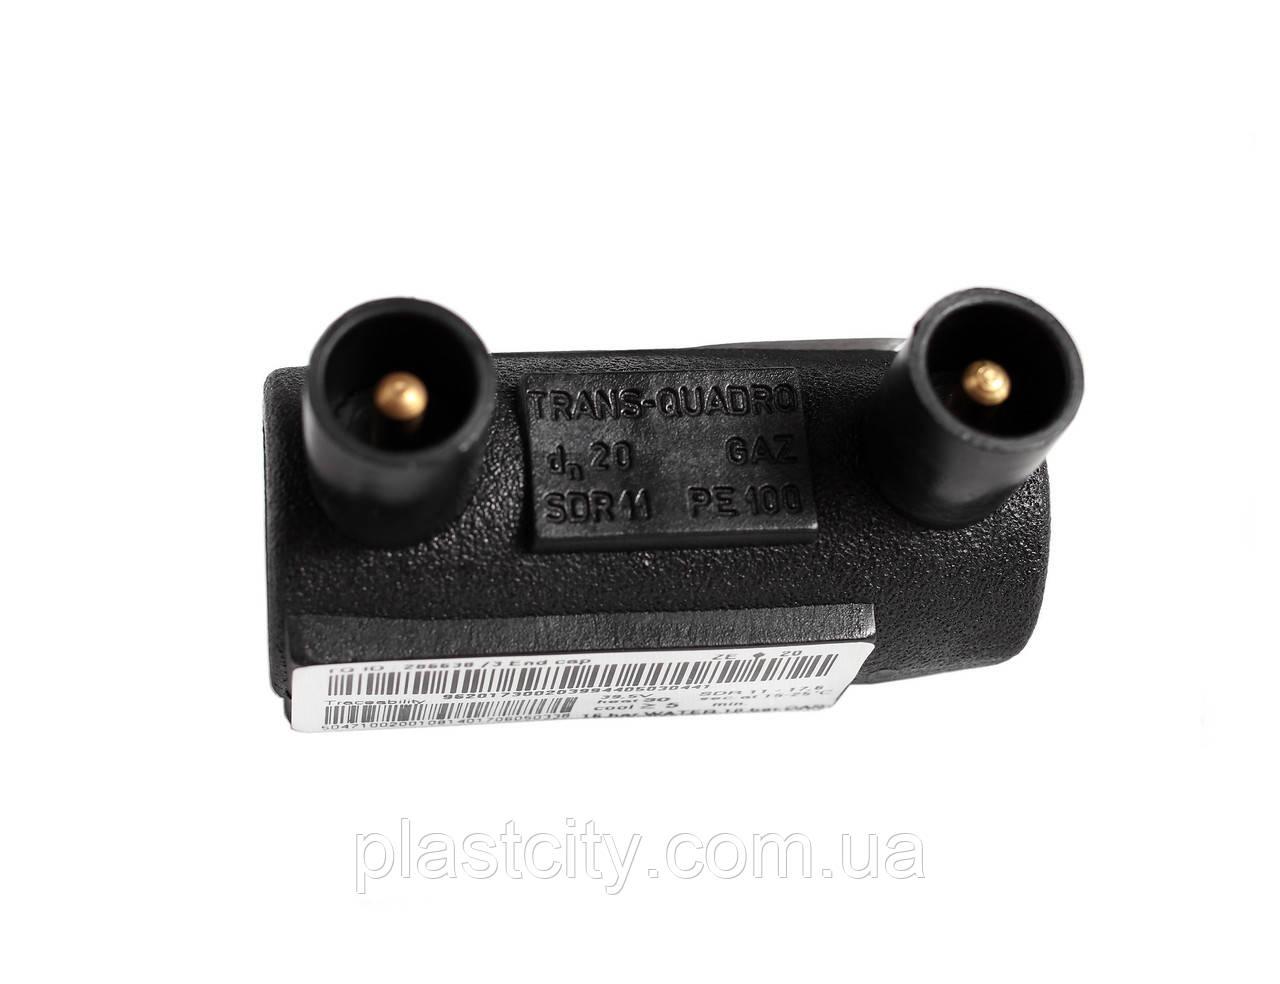 Муфта терморезисторная 125 мм ПЭ100 SDR11